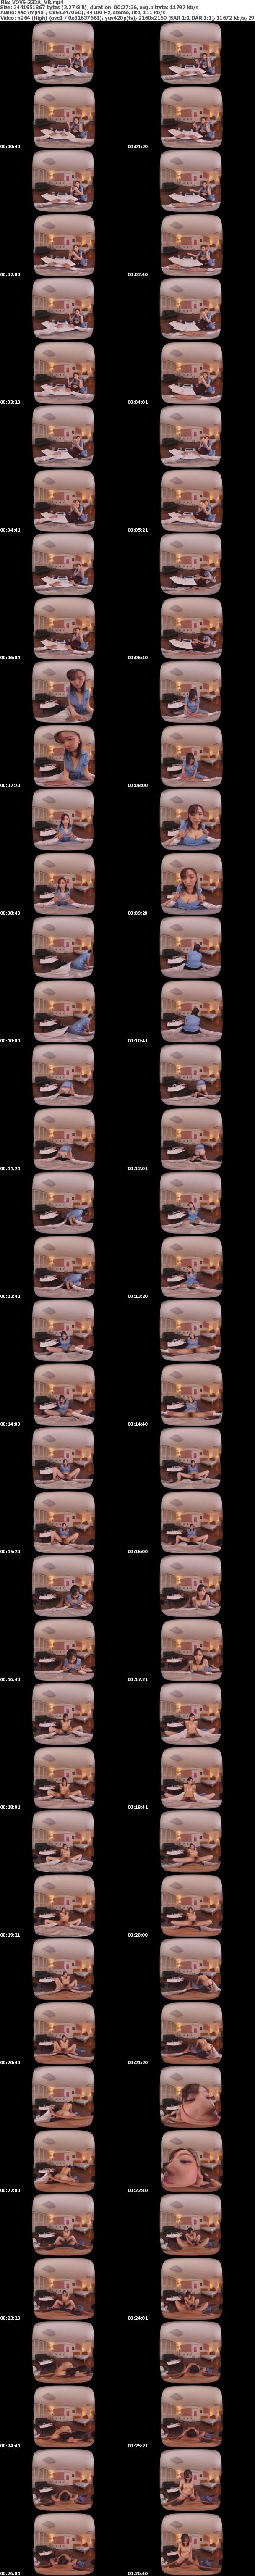 VR/3D VOVS-332 【VR】長尺45分・高画質 鈴木真夕 説教がましい家庭教師に媚薬を飲ますと豹変し ド淫乱オンナに!